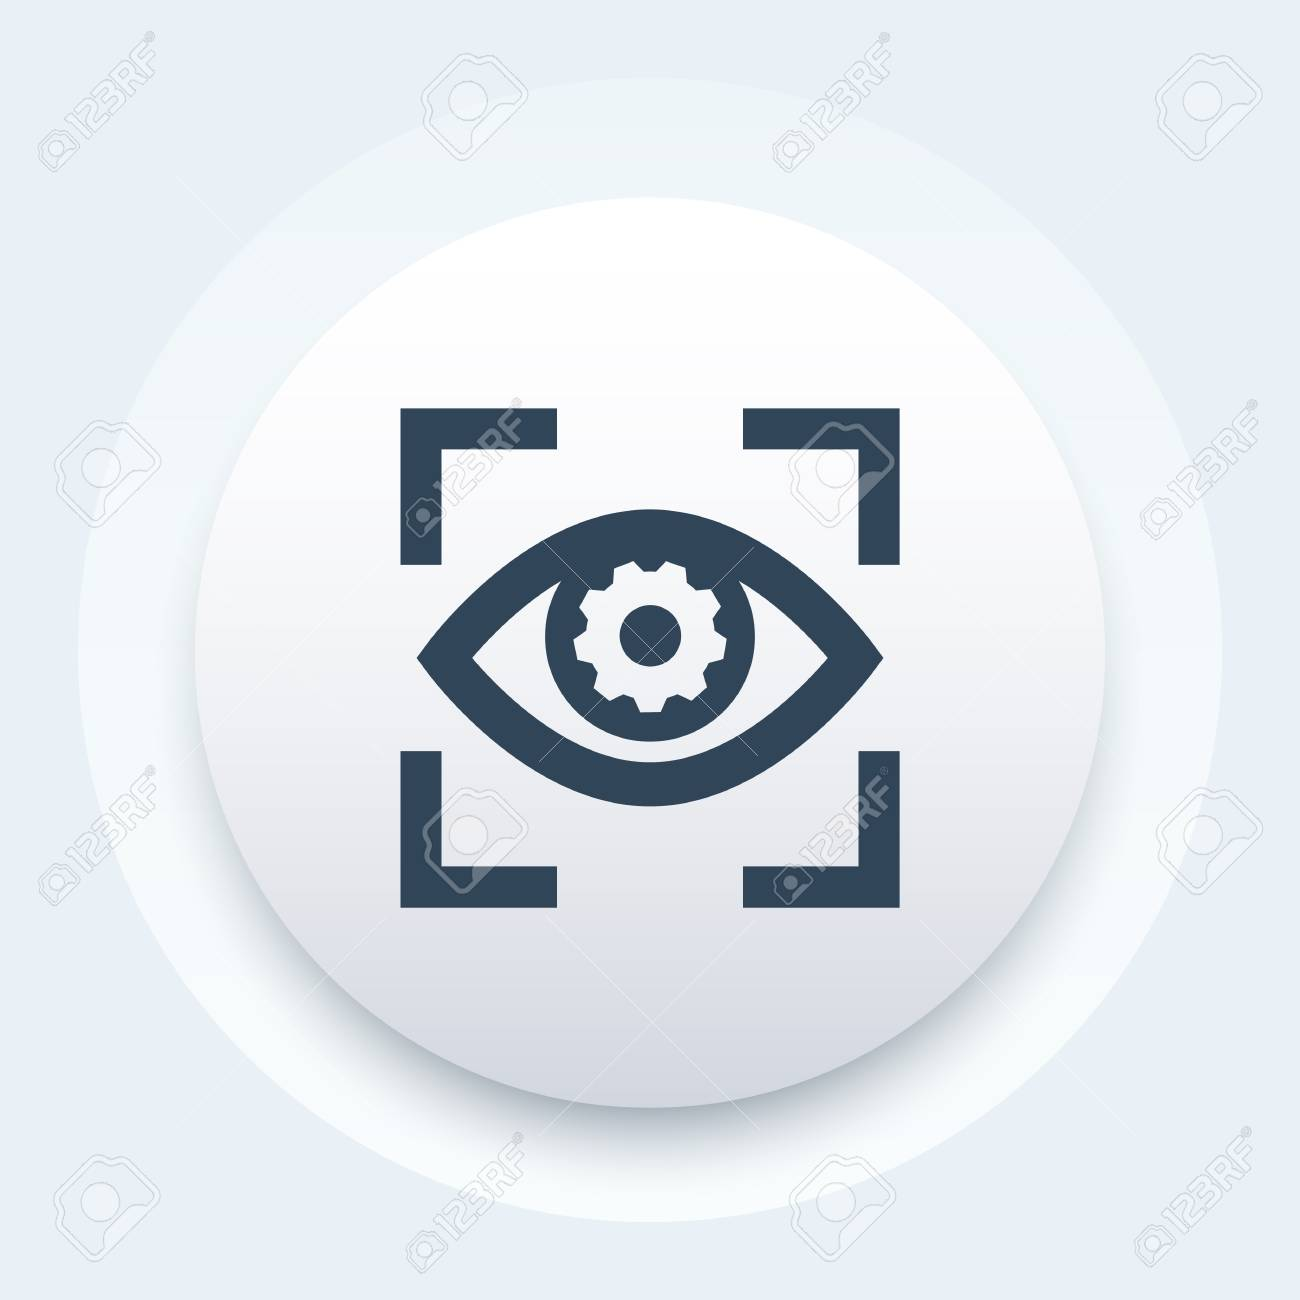 An eye with gear vector icon - 77954515